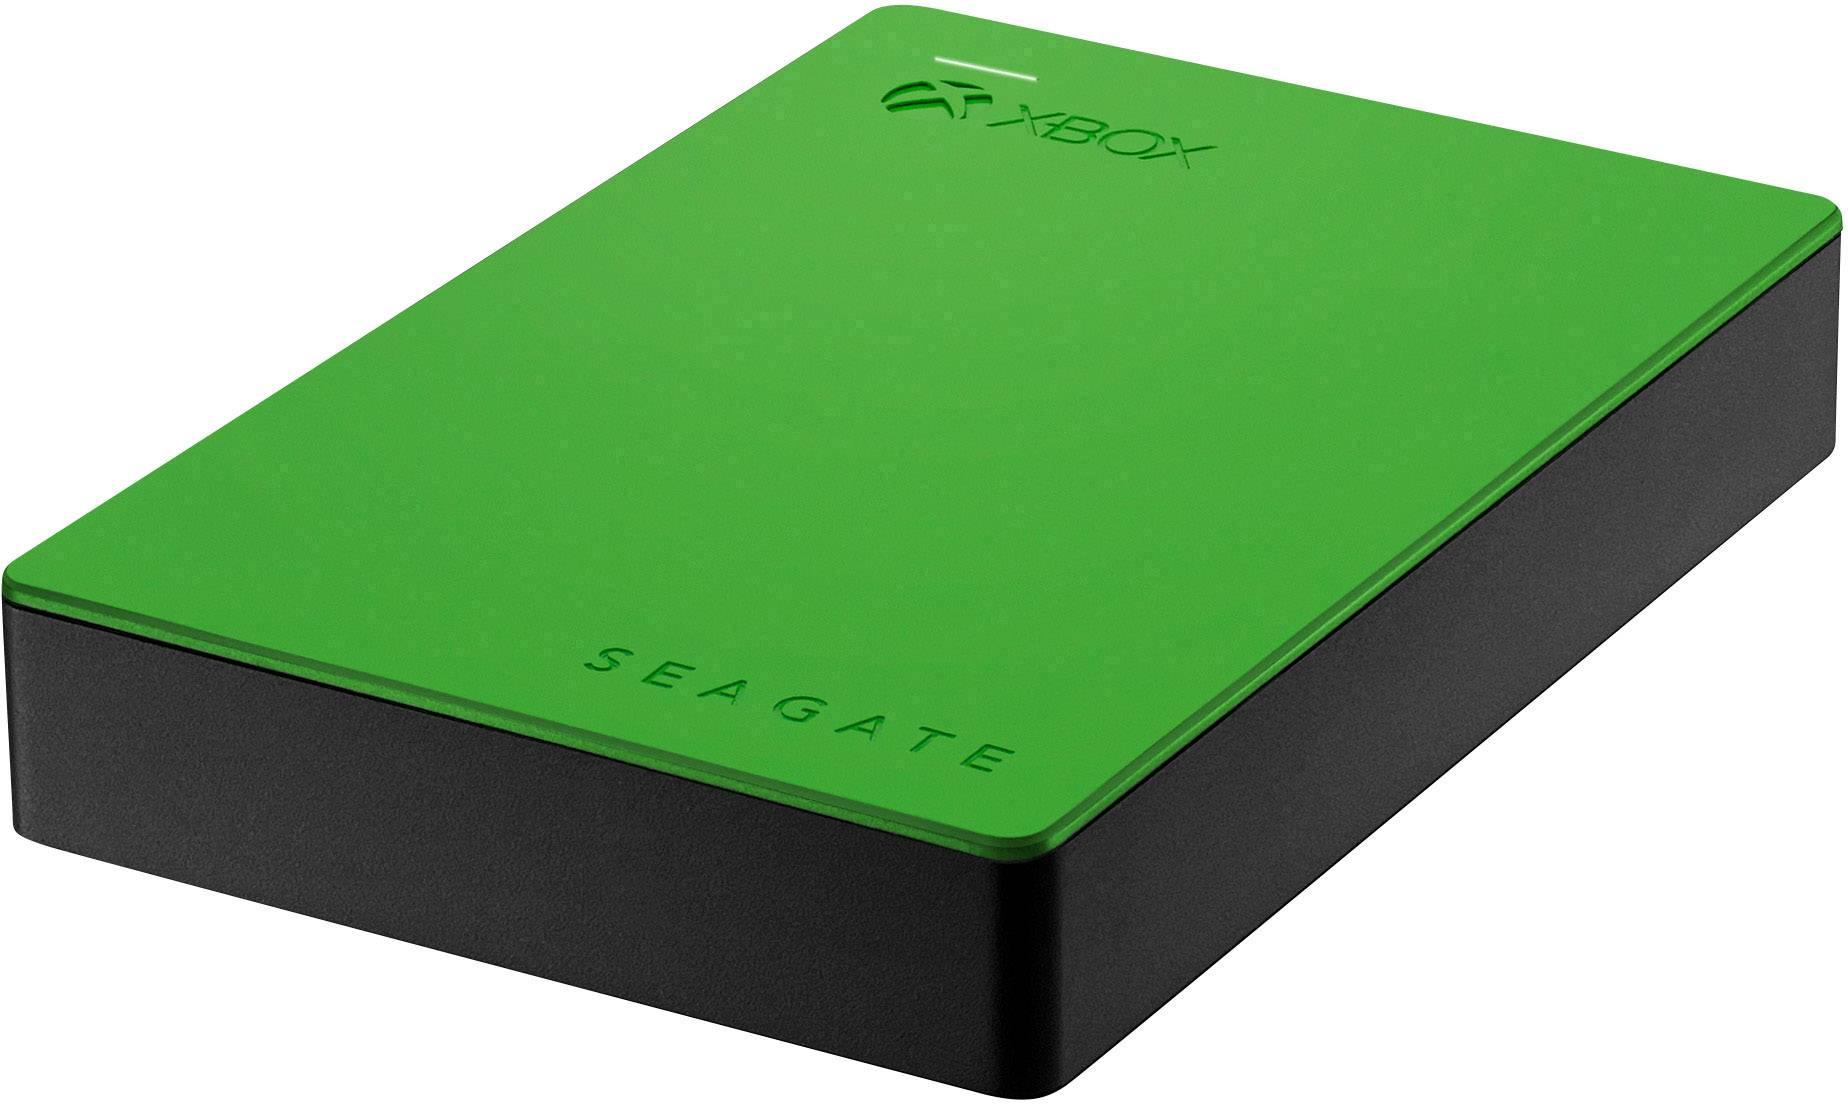 seagate gaming drive for xbox portable externe festplatte. Black Bedroom Furniture Sets. Home Design Ideas